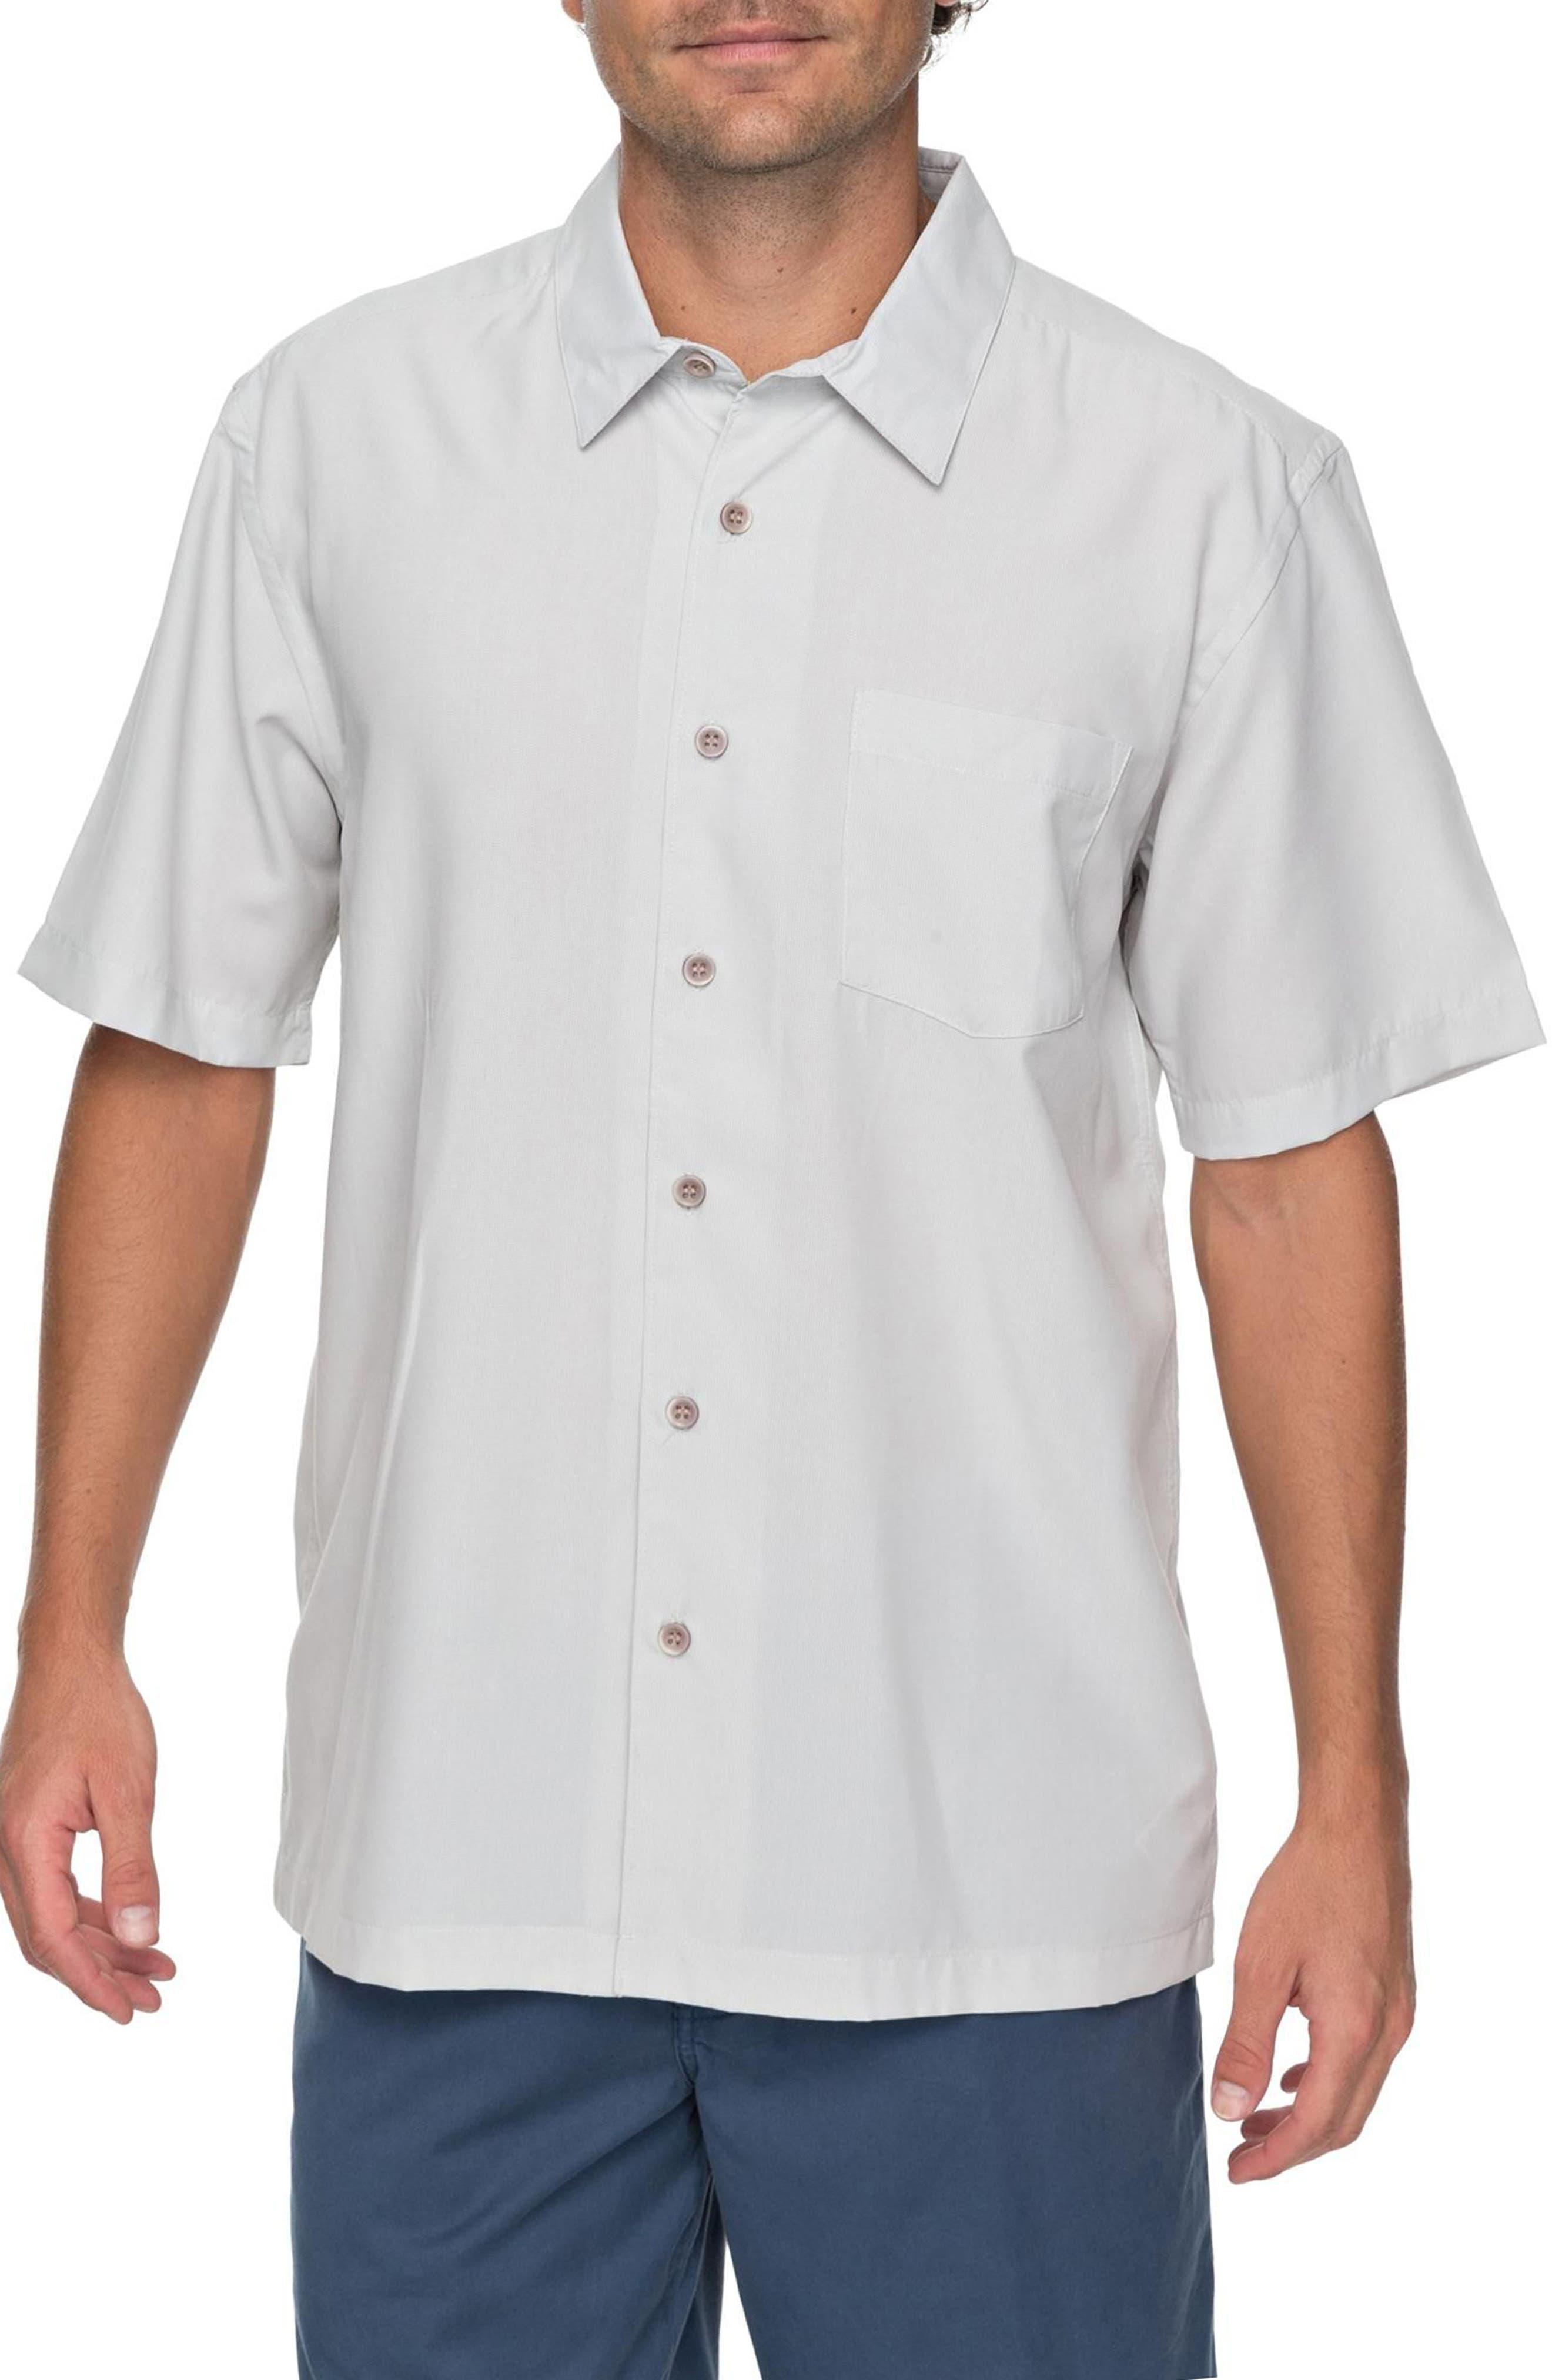 Cane Island Shirt,                         Main,                         color, Highrise